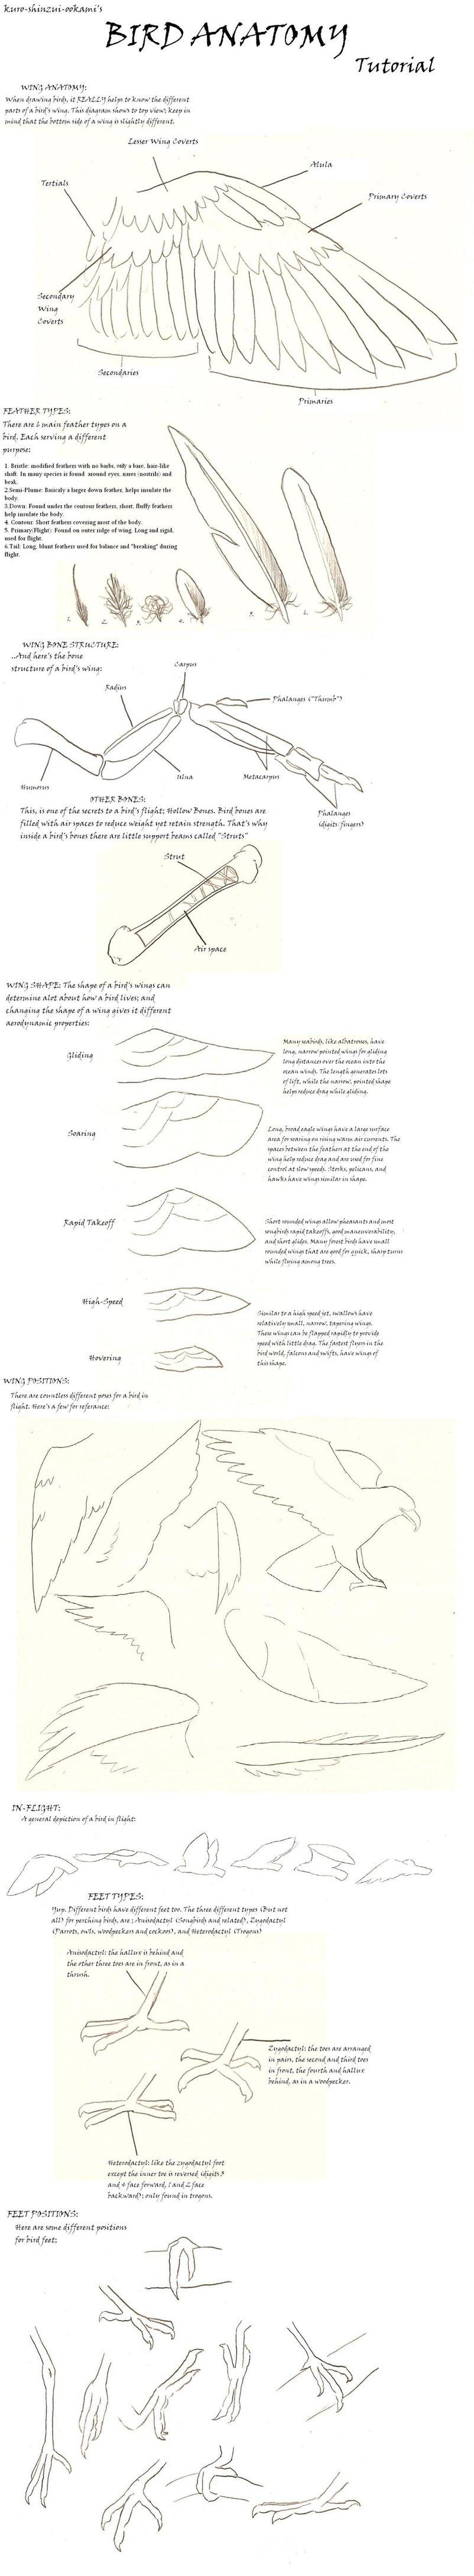 Bird Anatomy Tutorial by Anima-Lux-Artifex on DeviantArt | drawing ...